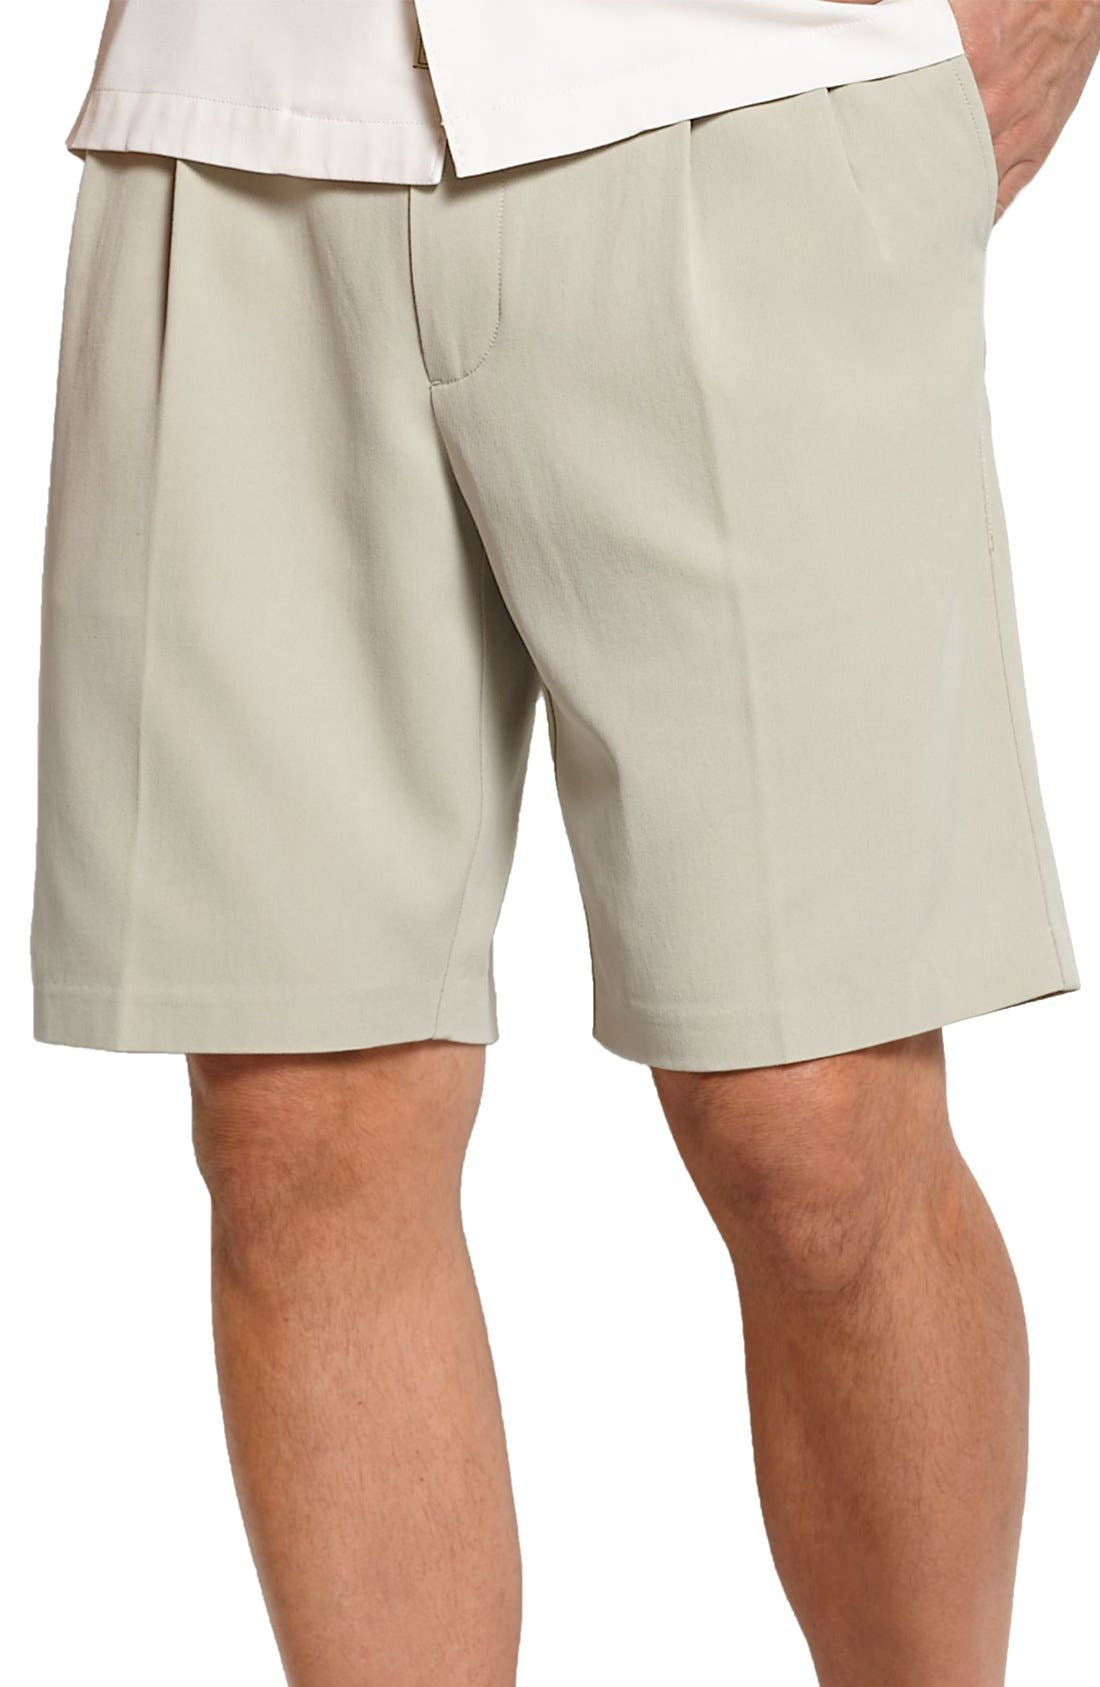 St. Thomas Pleated Shorts,                             Main thumbnail 1, color,                             Abbey Stone